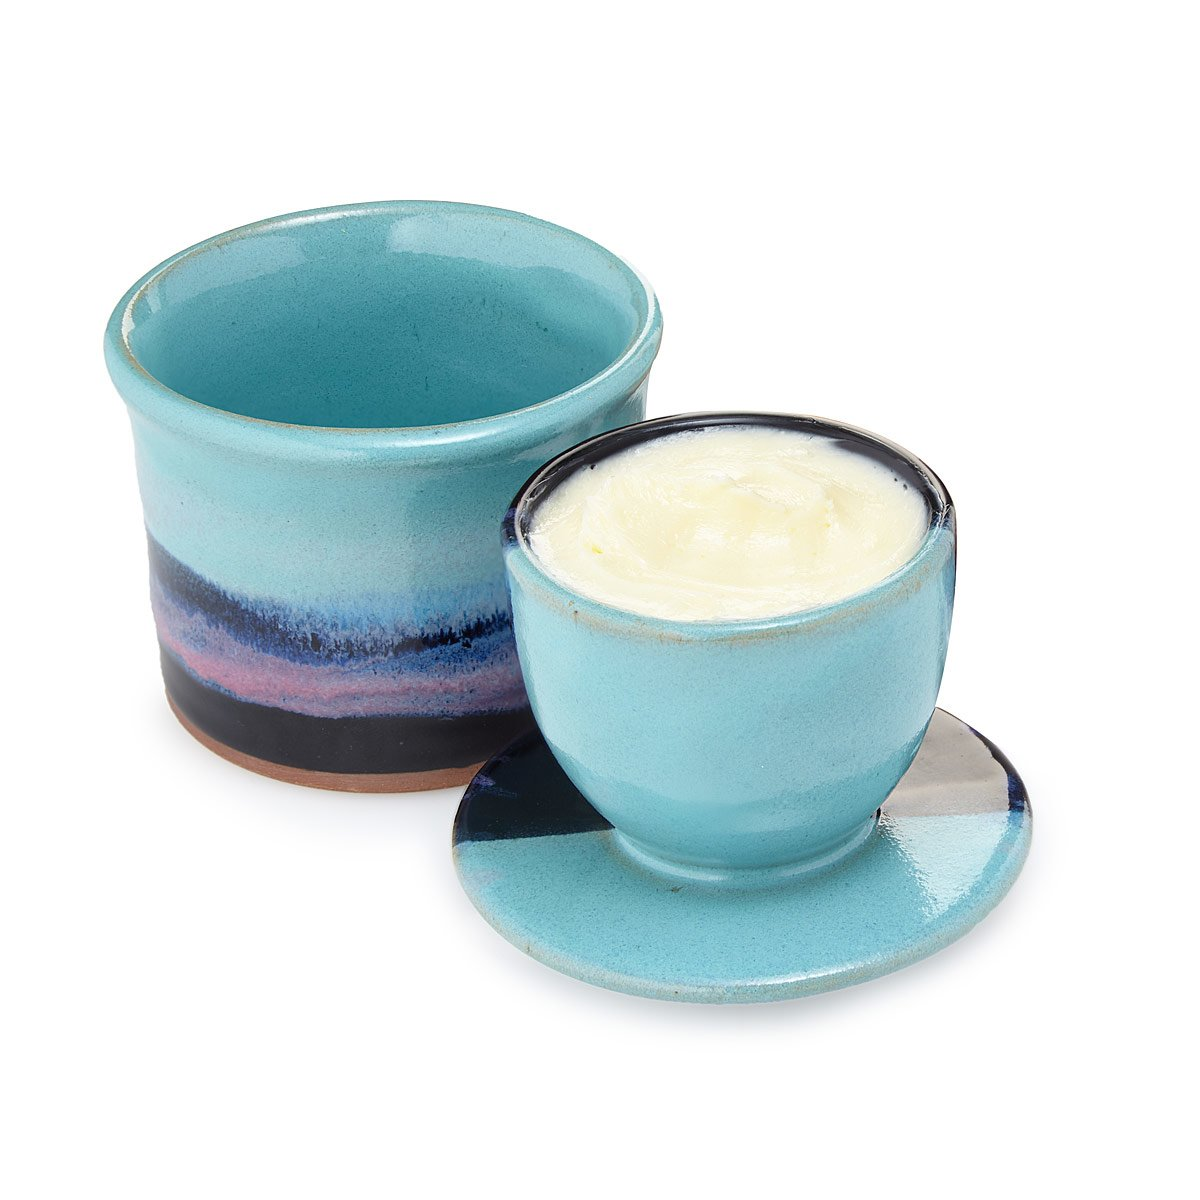 Stoneware Spreadable Butter Keeper | Handmade Kitchen Housewares ...